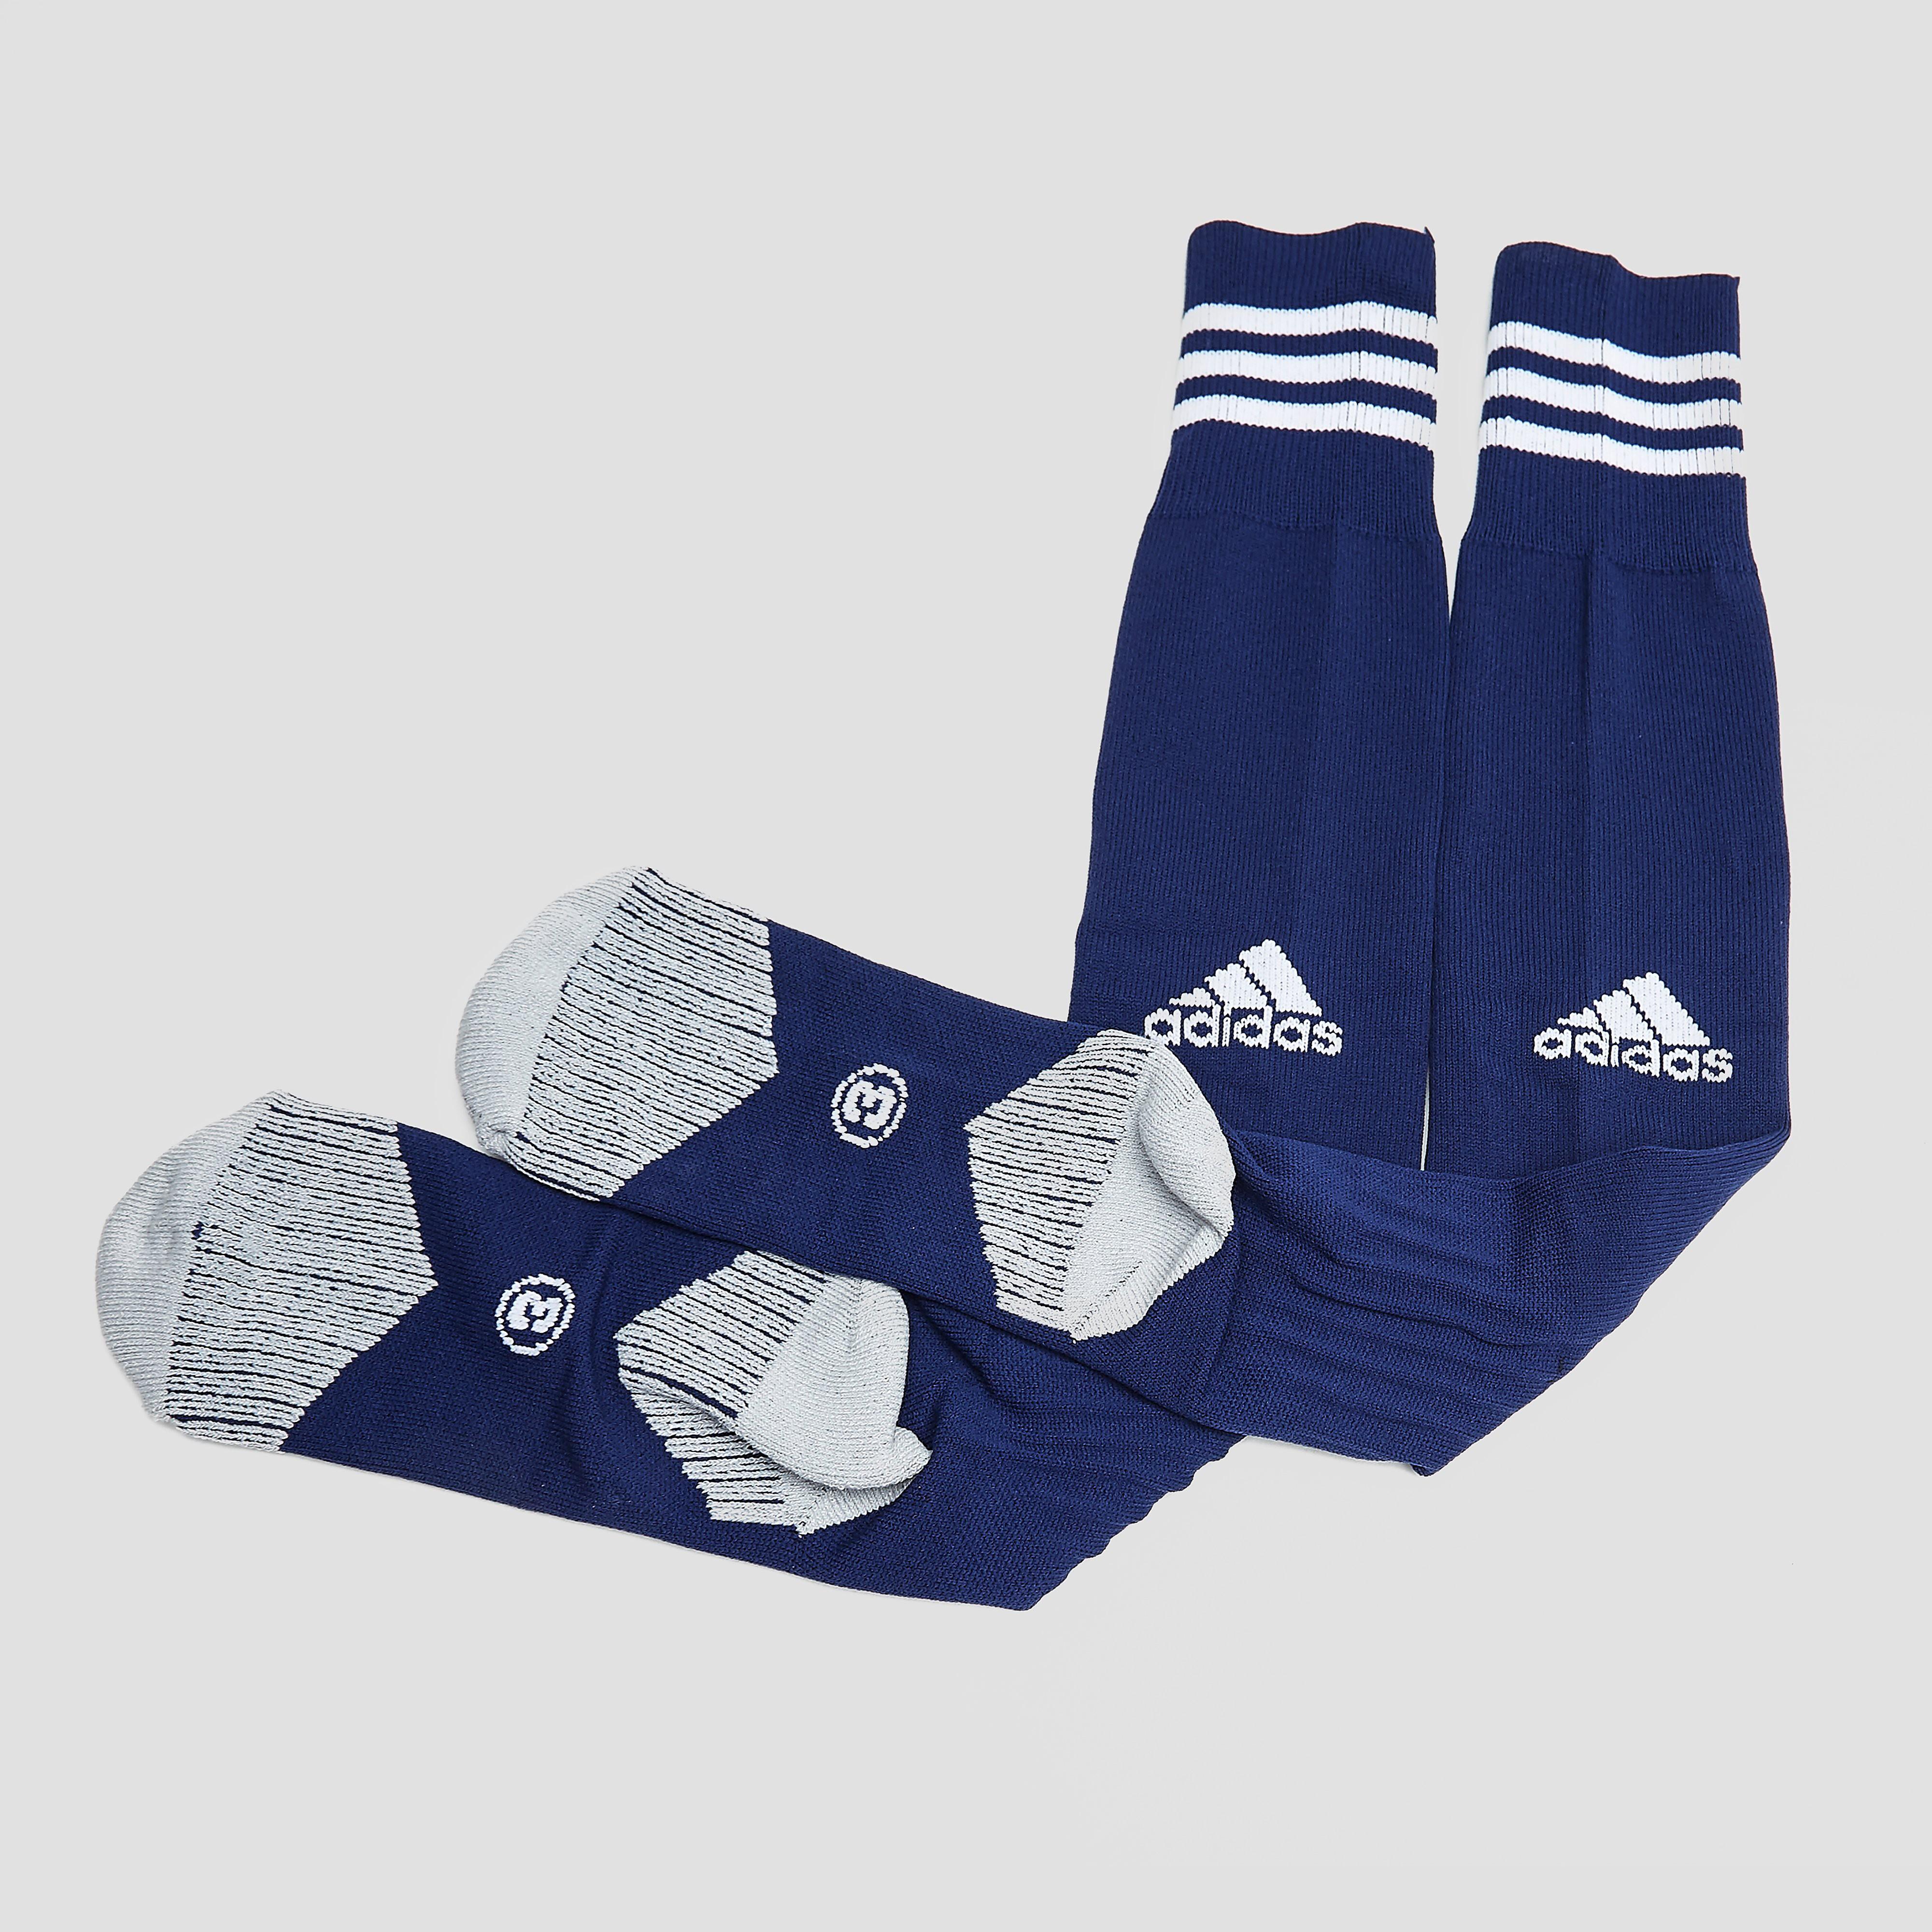 adidas Adisocks 12, Blauw, 31-33, Male, Football-soccer